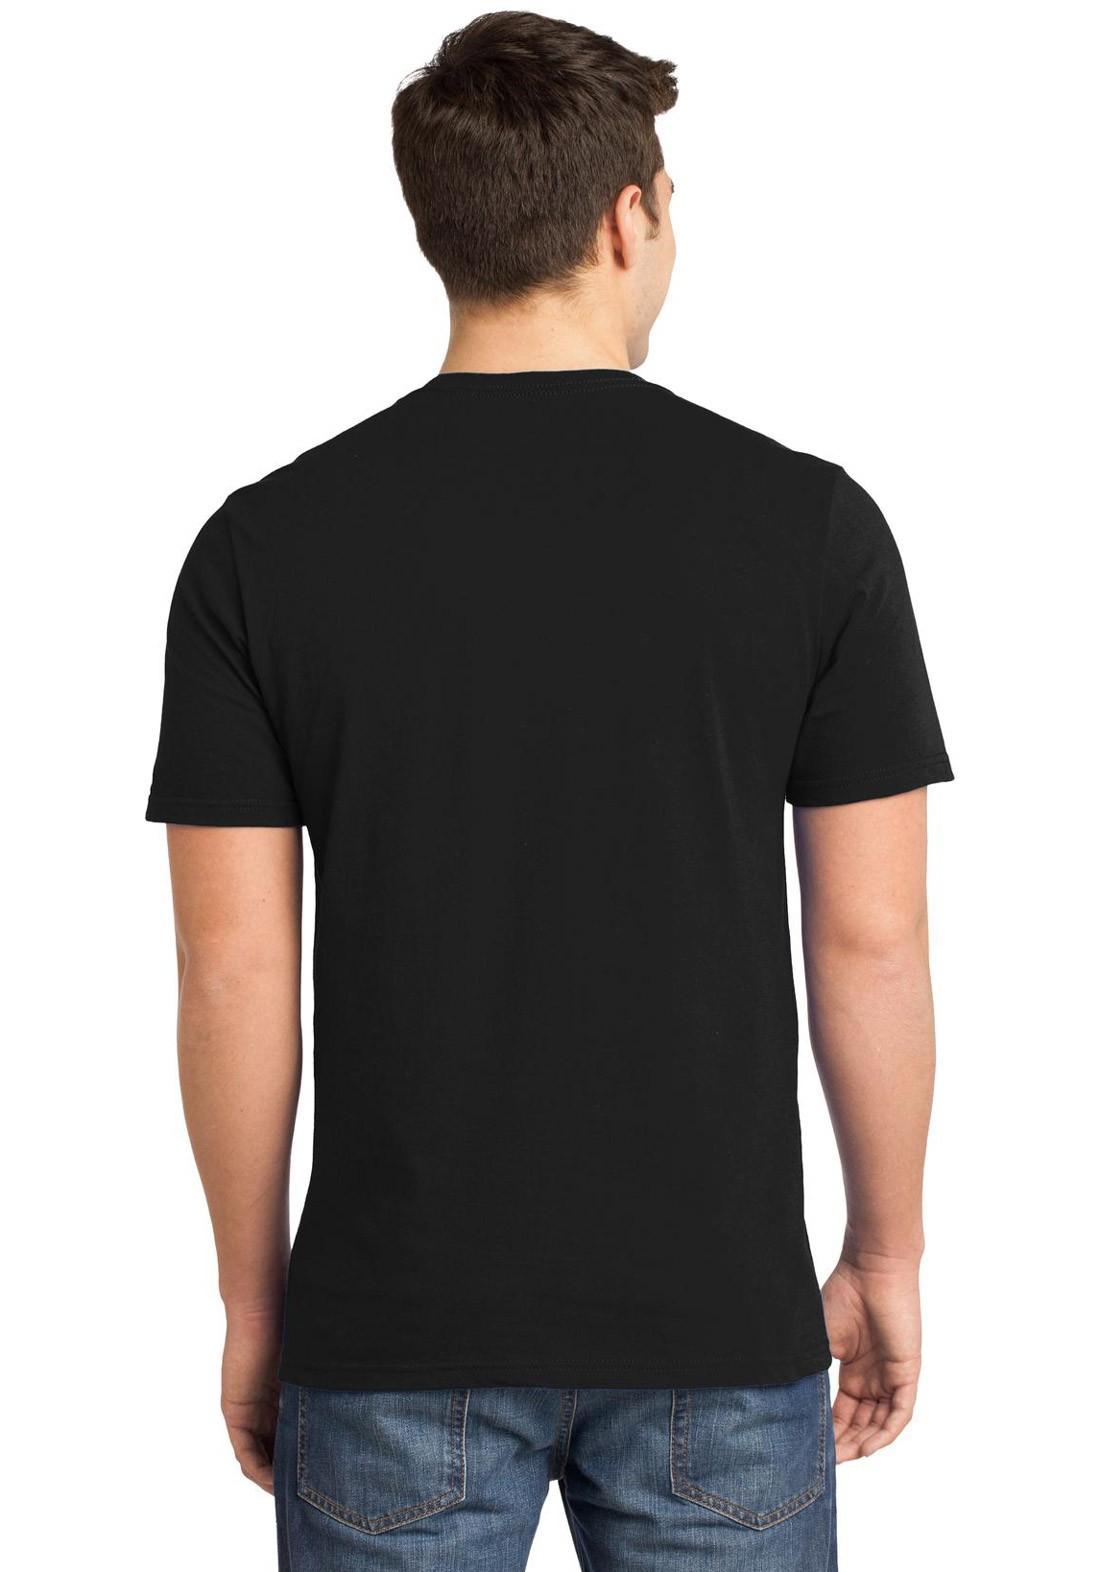 Camiseta Masculina Universitária Faculdade Pedagogia